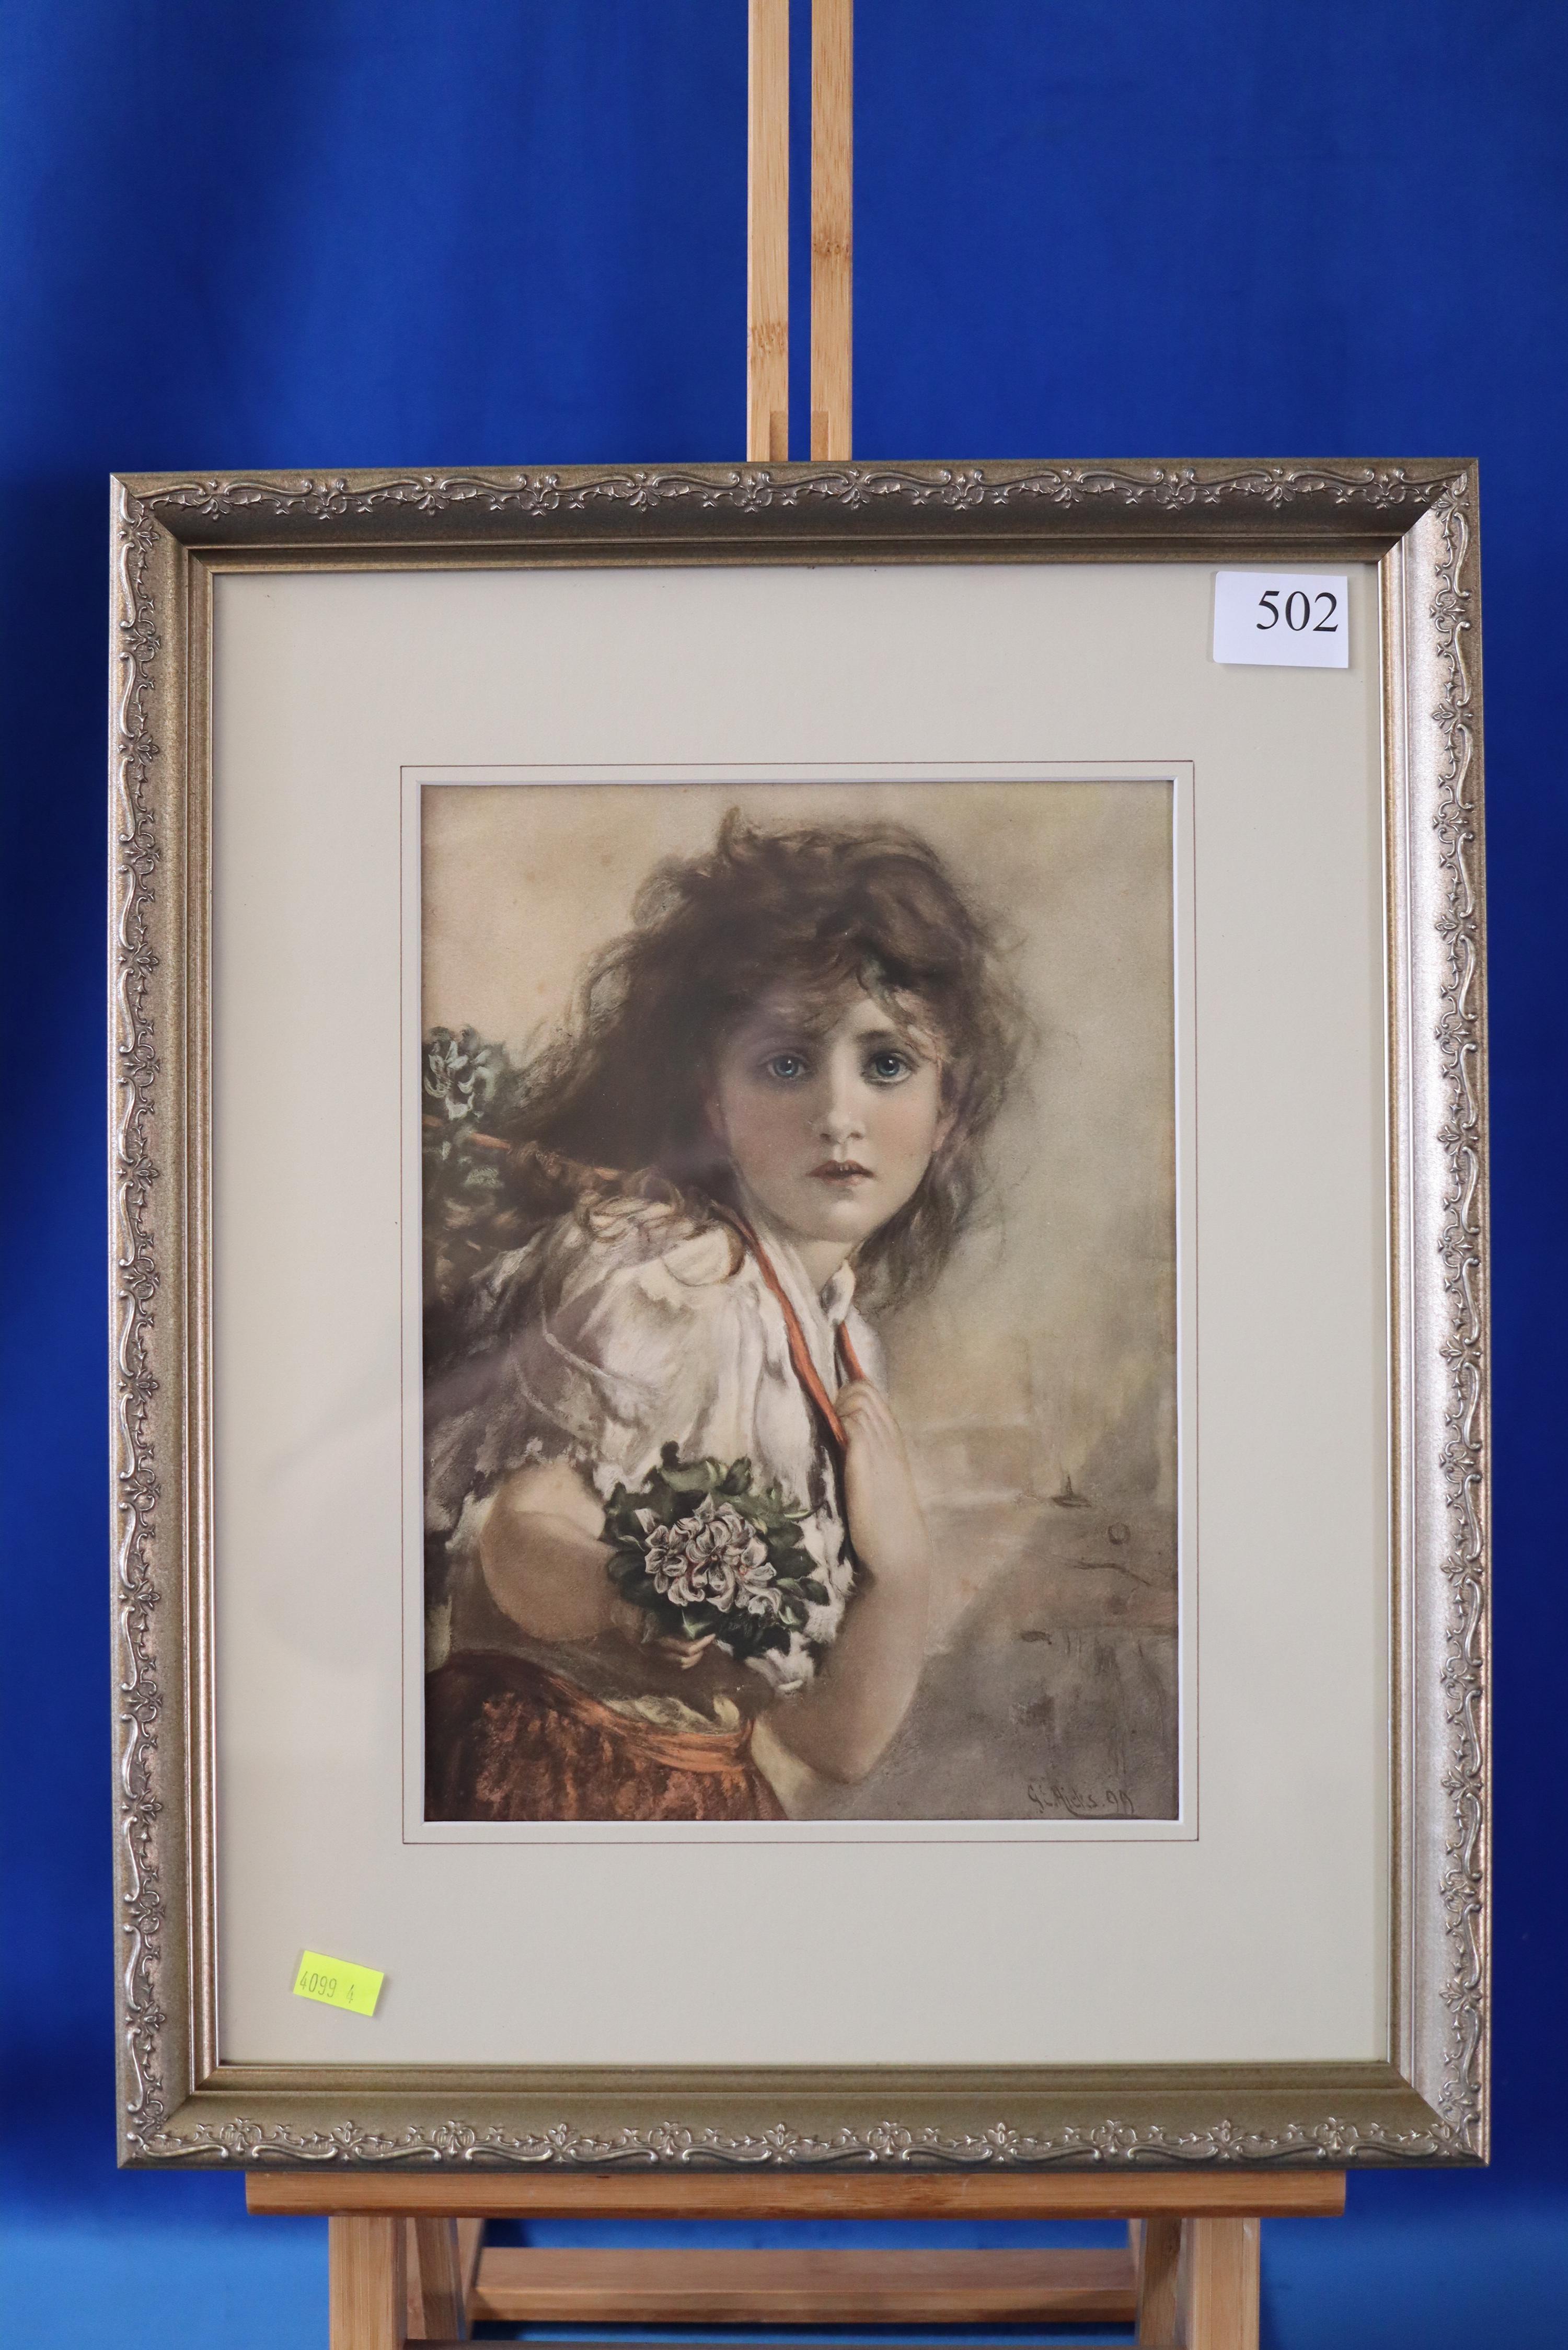 PRINT OF FLOWER SELLER 1899 GE AILES